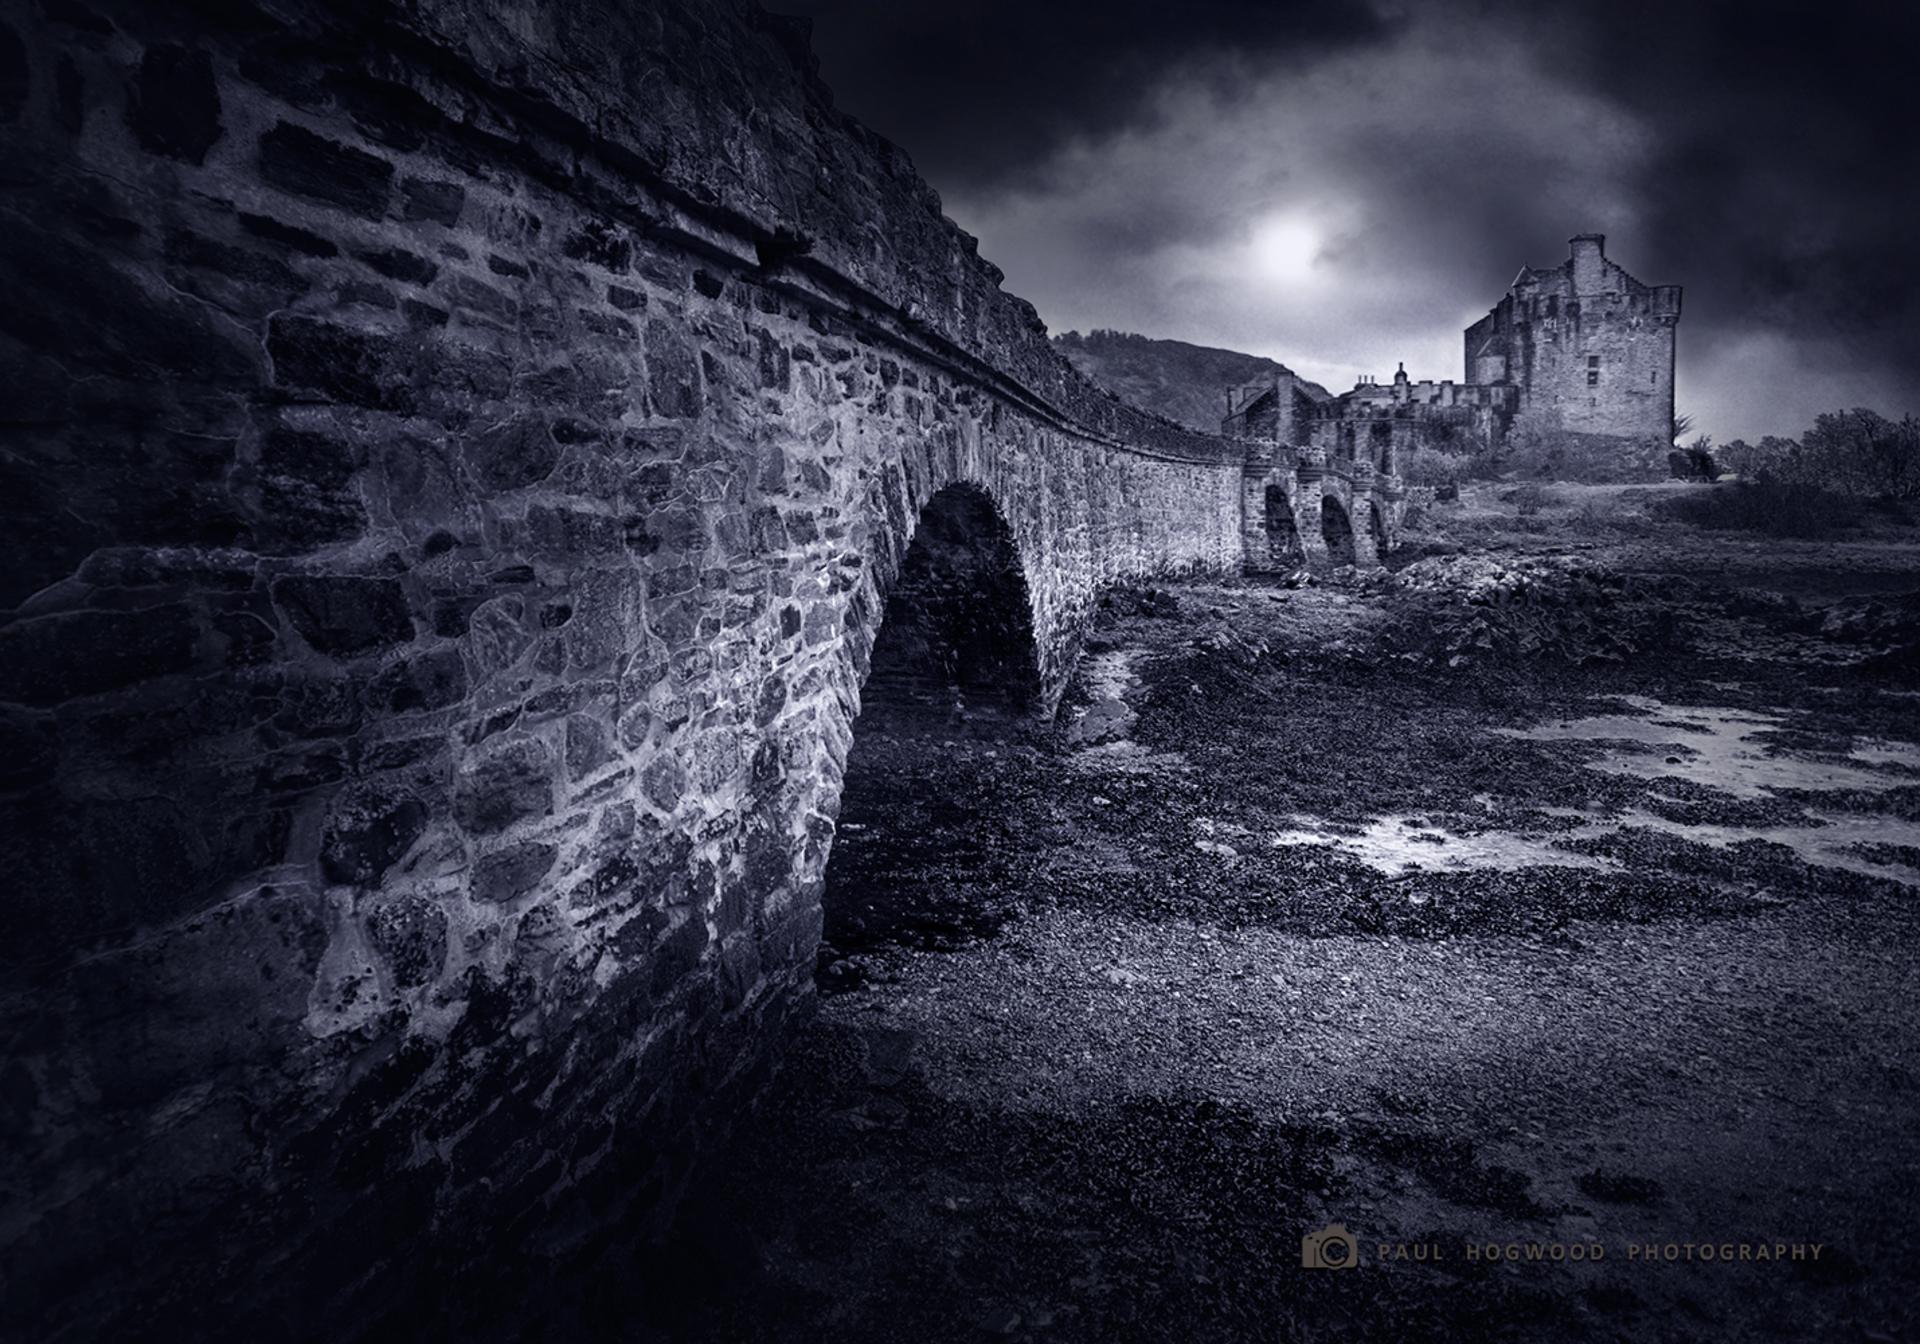 Eilean Donan Castle. On Loch Duich, Scotland